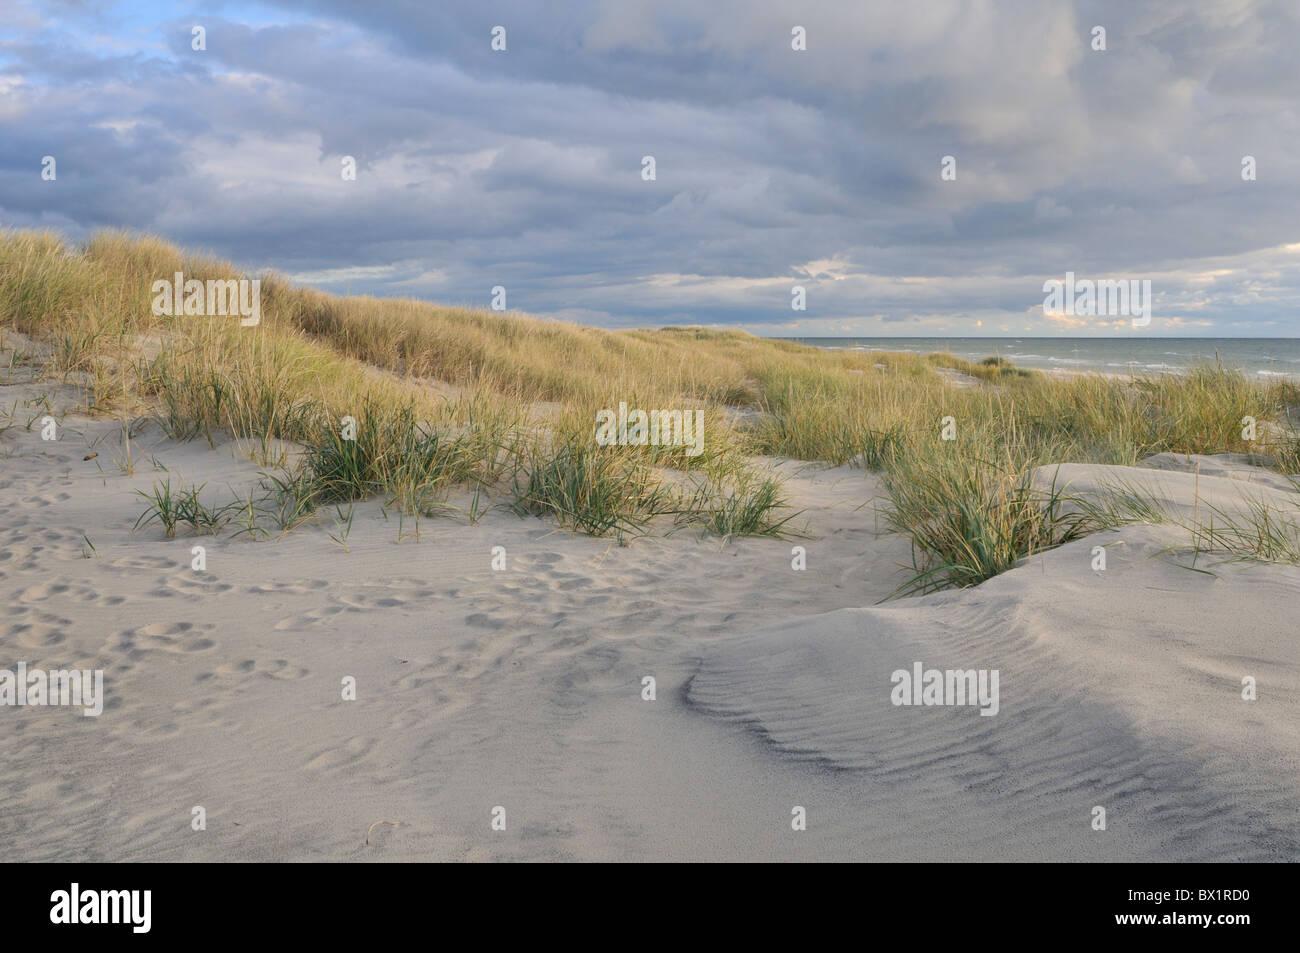 Shifting sand dunes cover the excellent beach Sandhammaren, Sweden - Stock Image